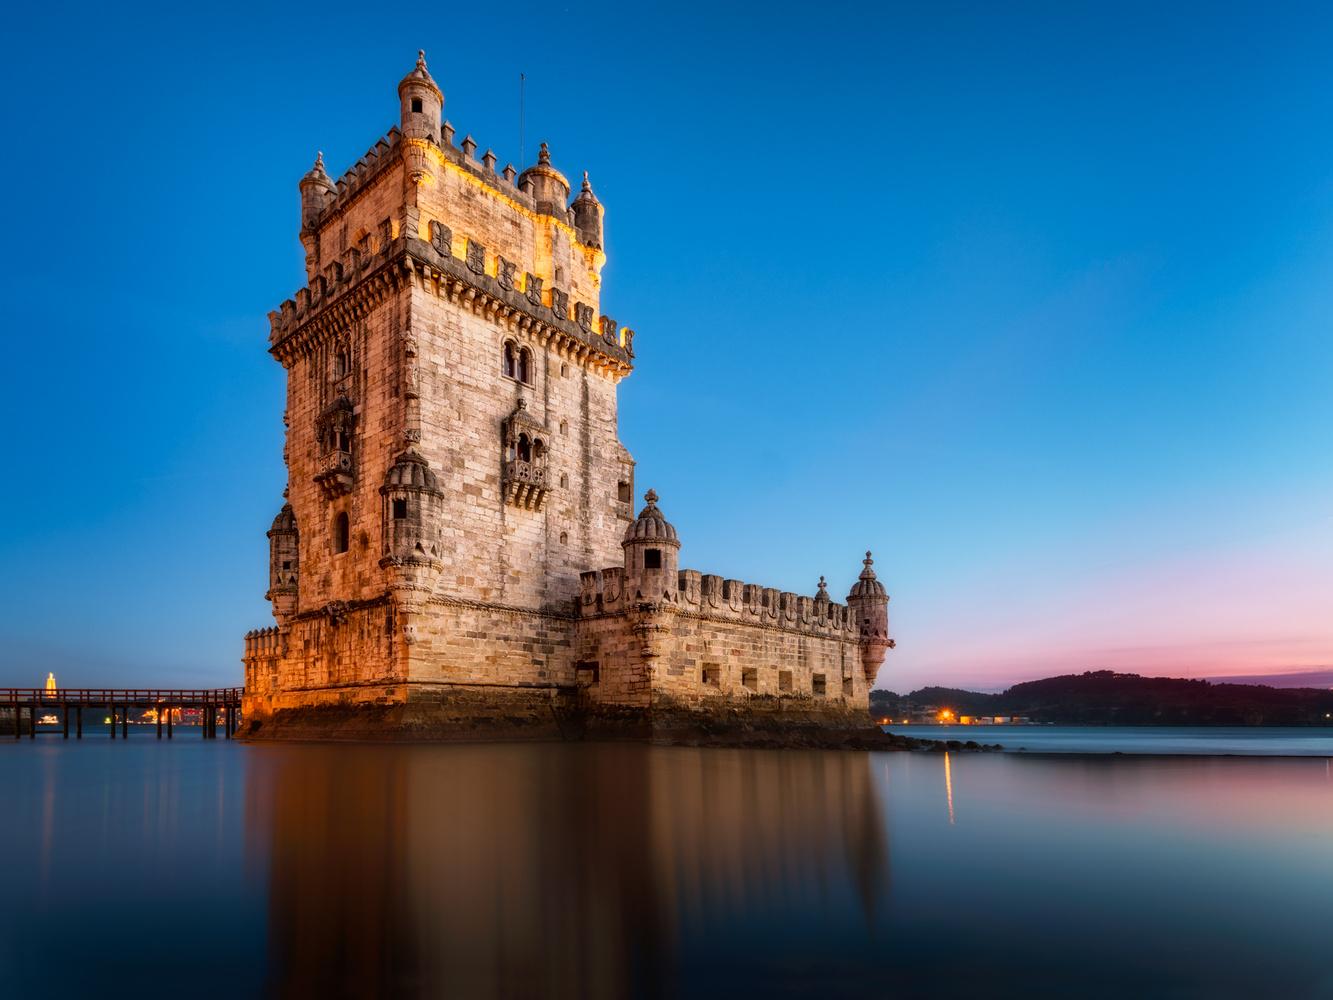 Belem Tower | Lisbon, Portugal by Nico Trinkhaus